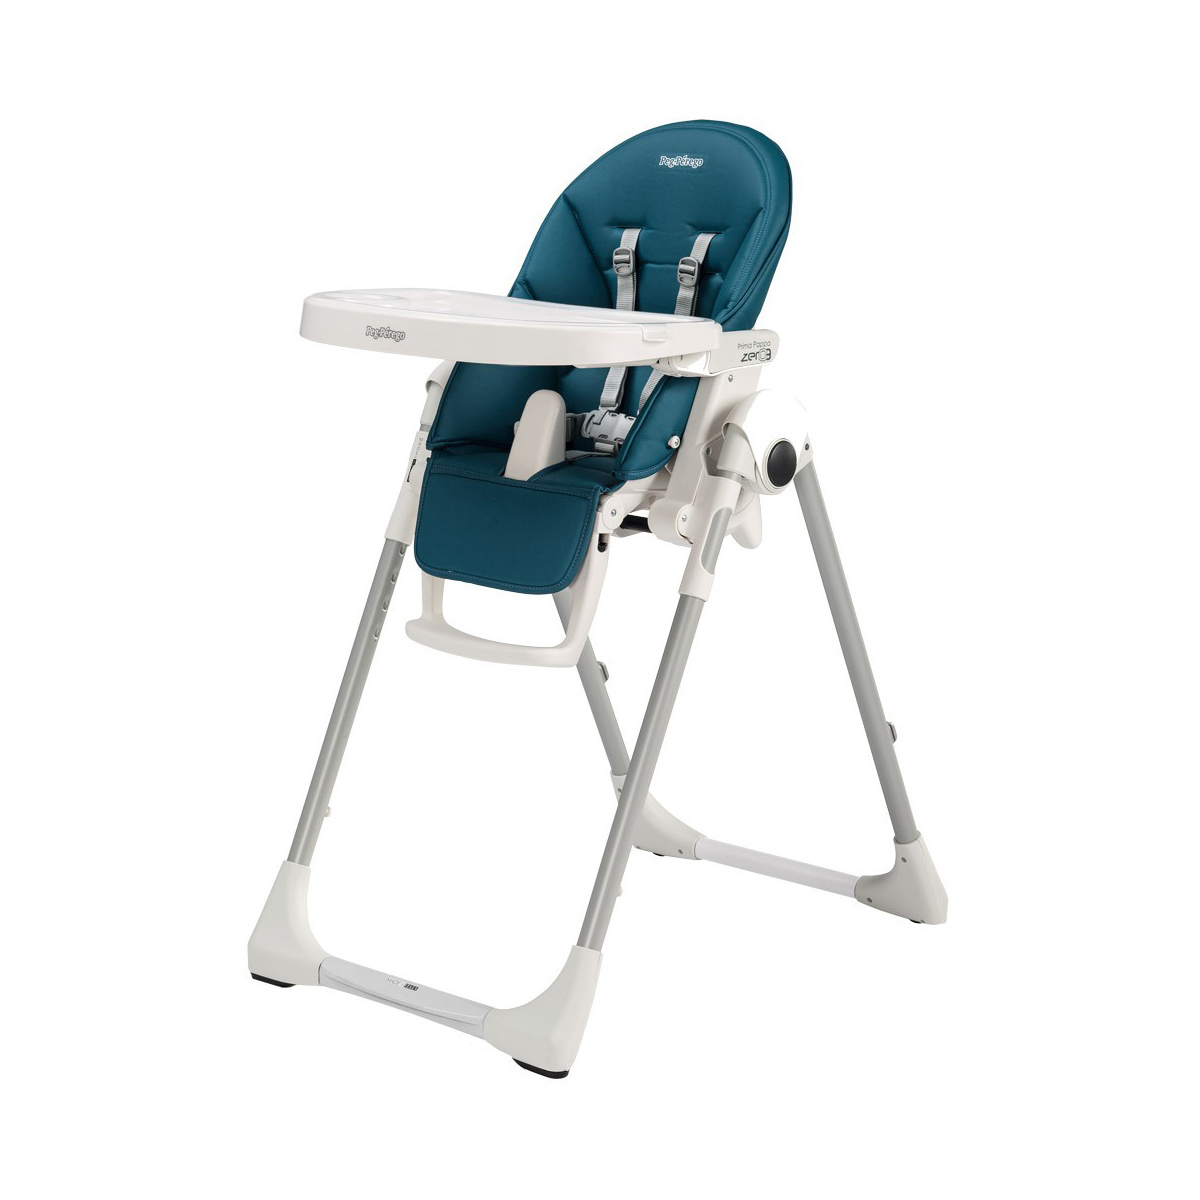 Peg p rego chaise prima pappa zero 3 petrolio chaise haute peg p rego sur l 39 armoire de b b - Chaise haute peg perego zero 3 ...